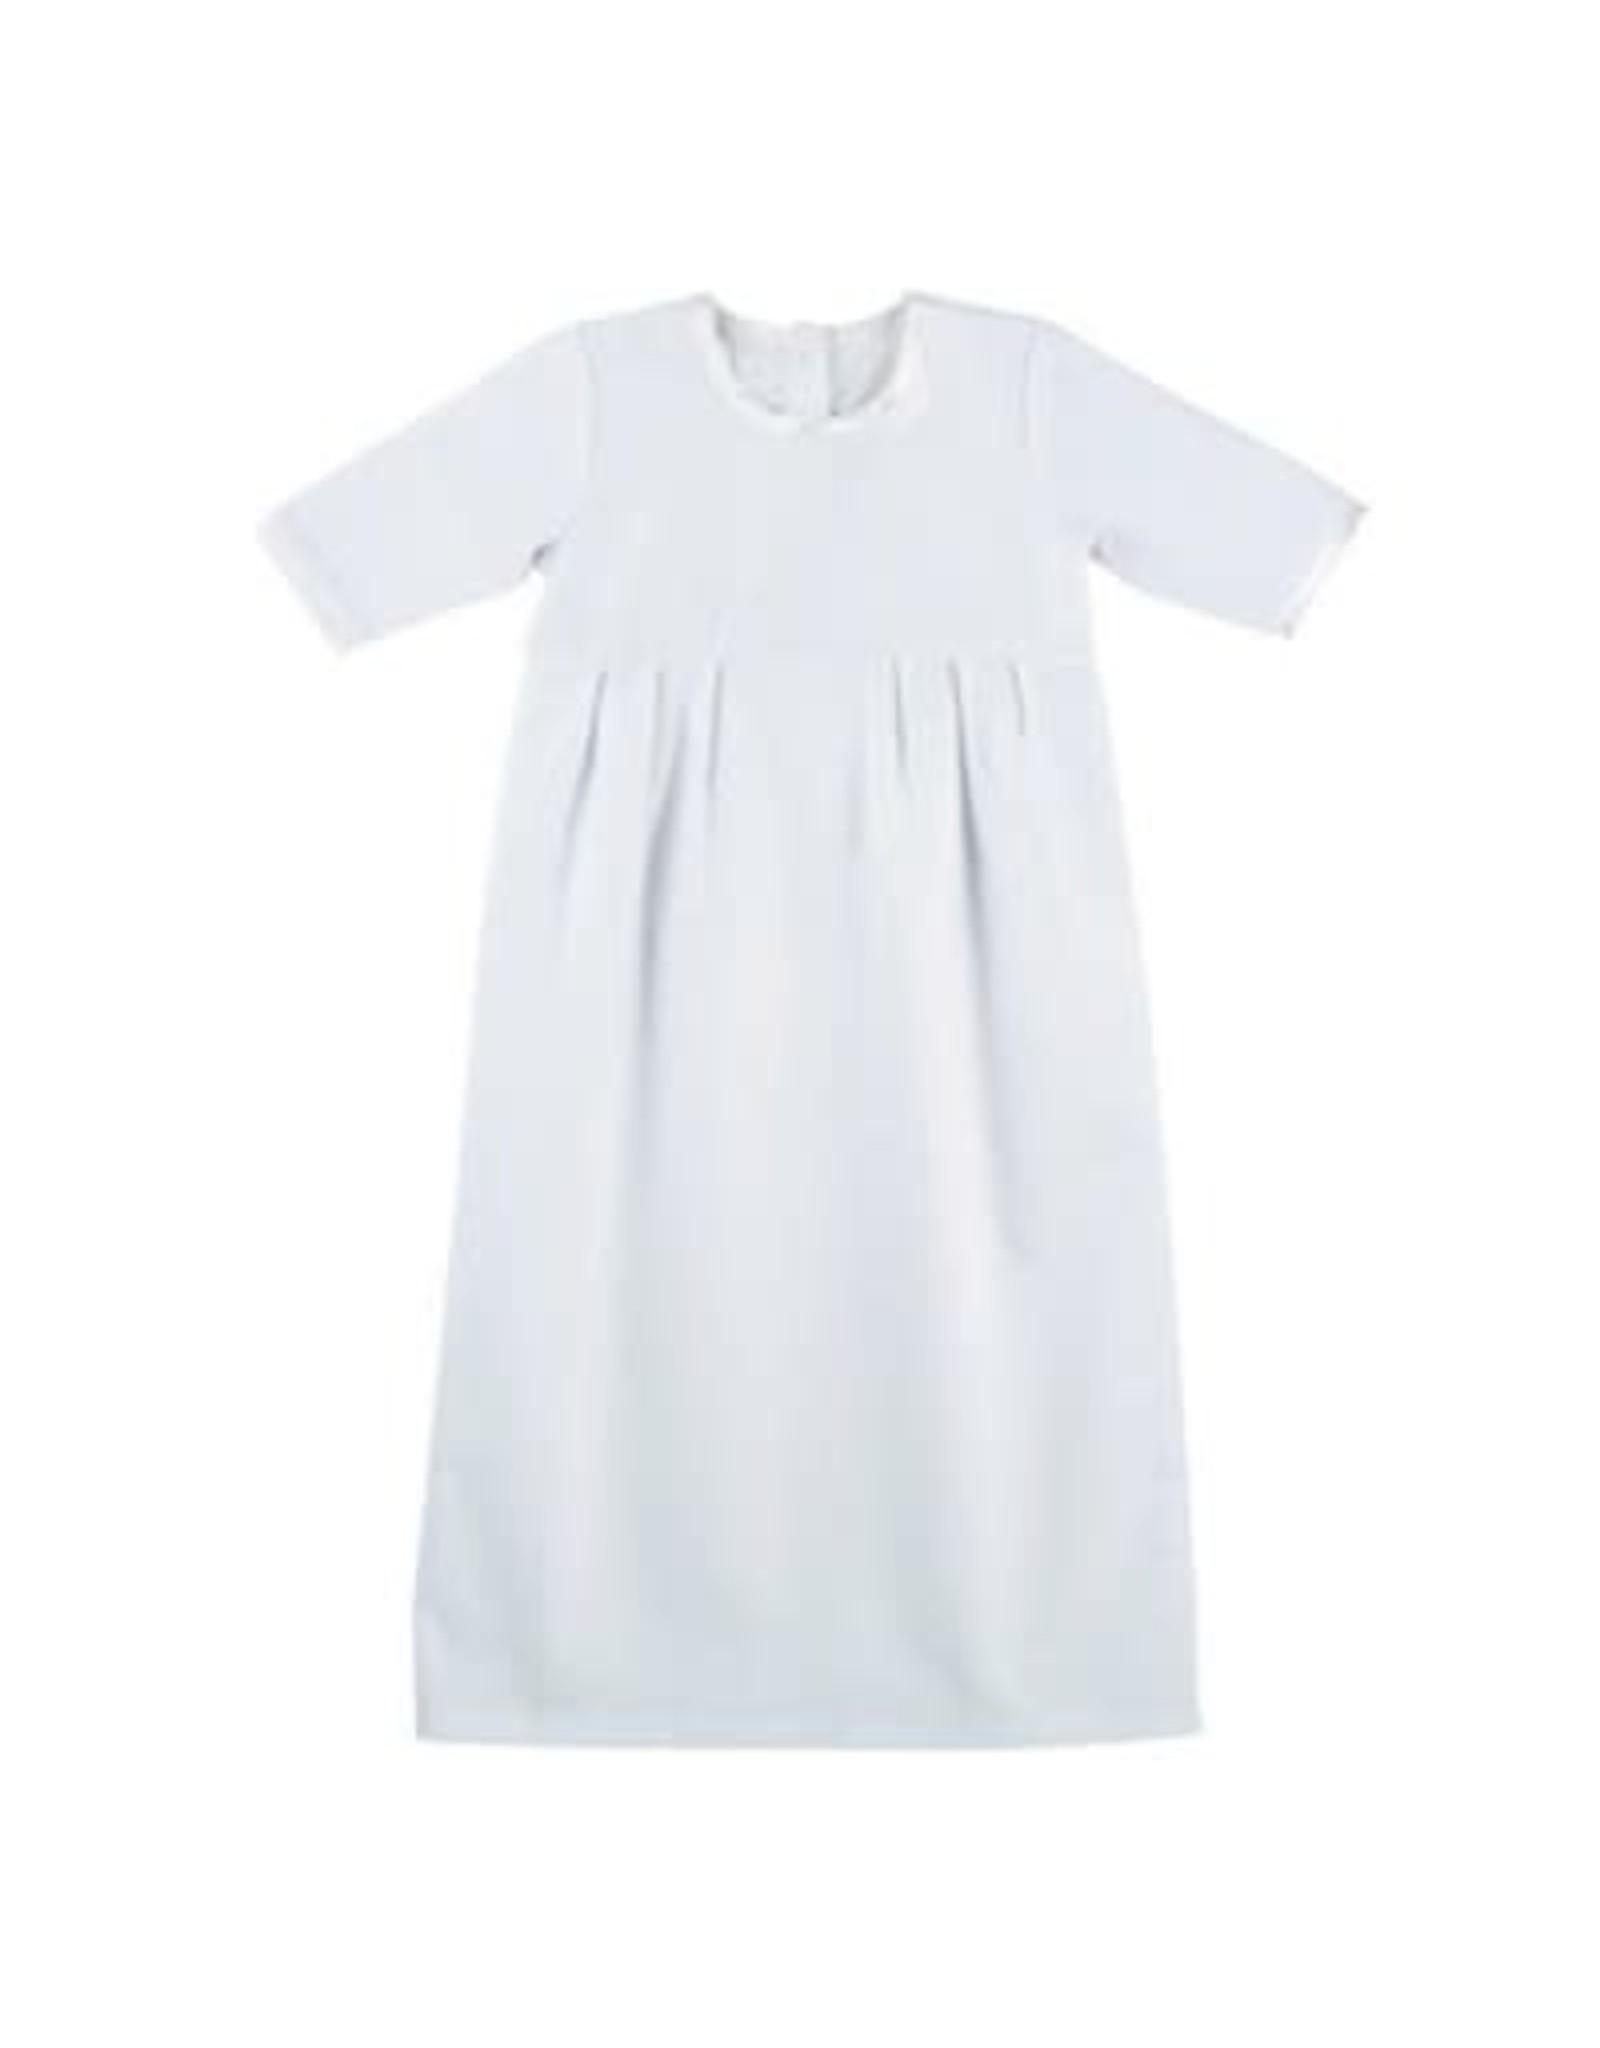 Baptism Gown Boy 0 - 3 Months